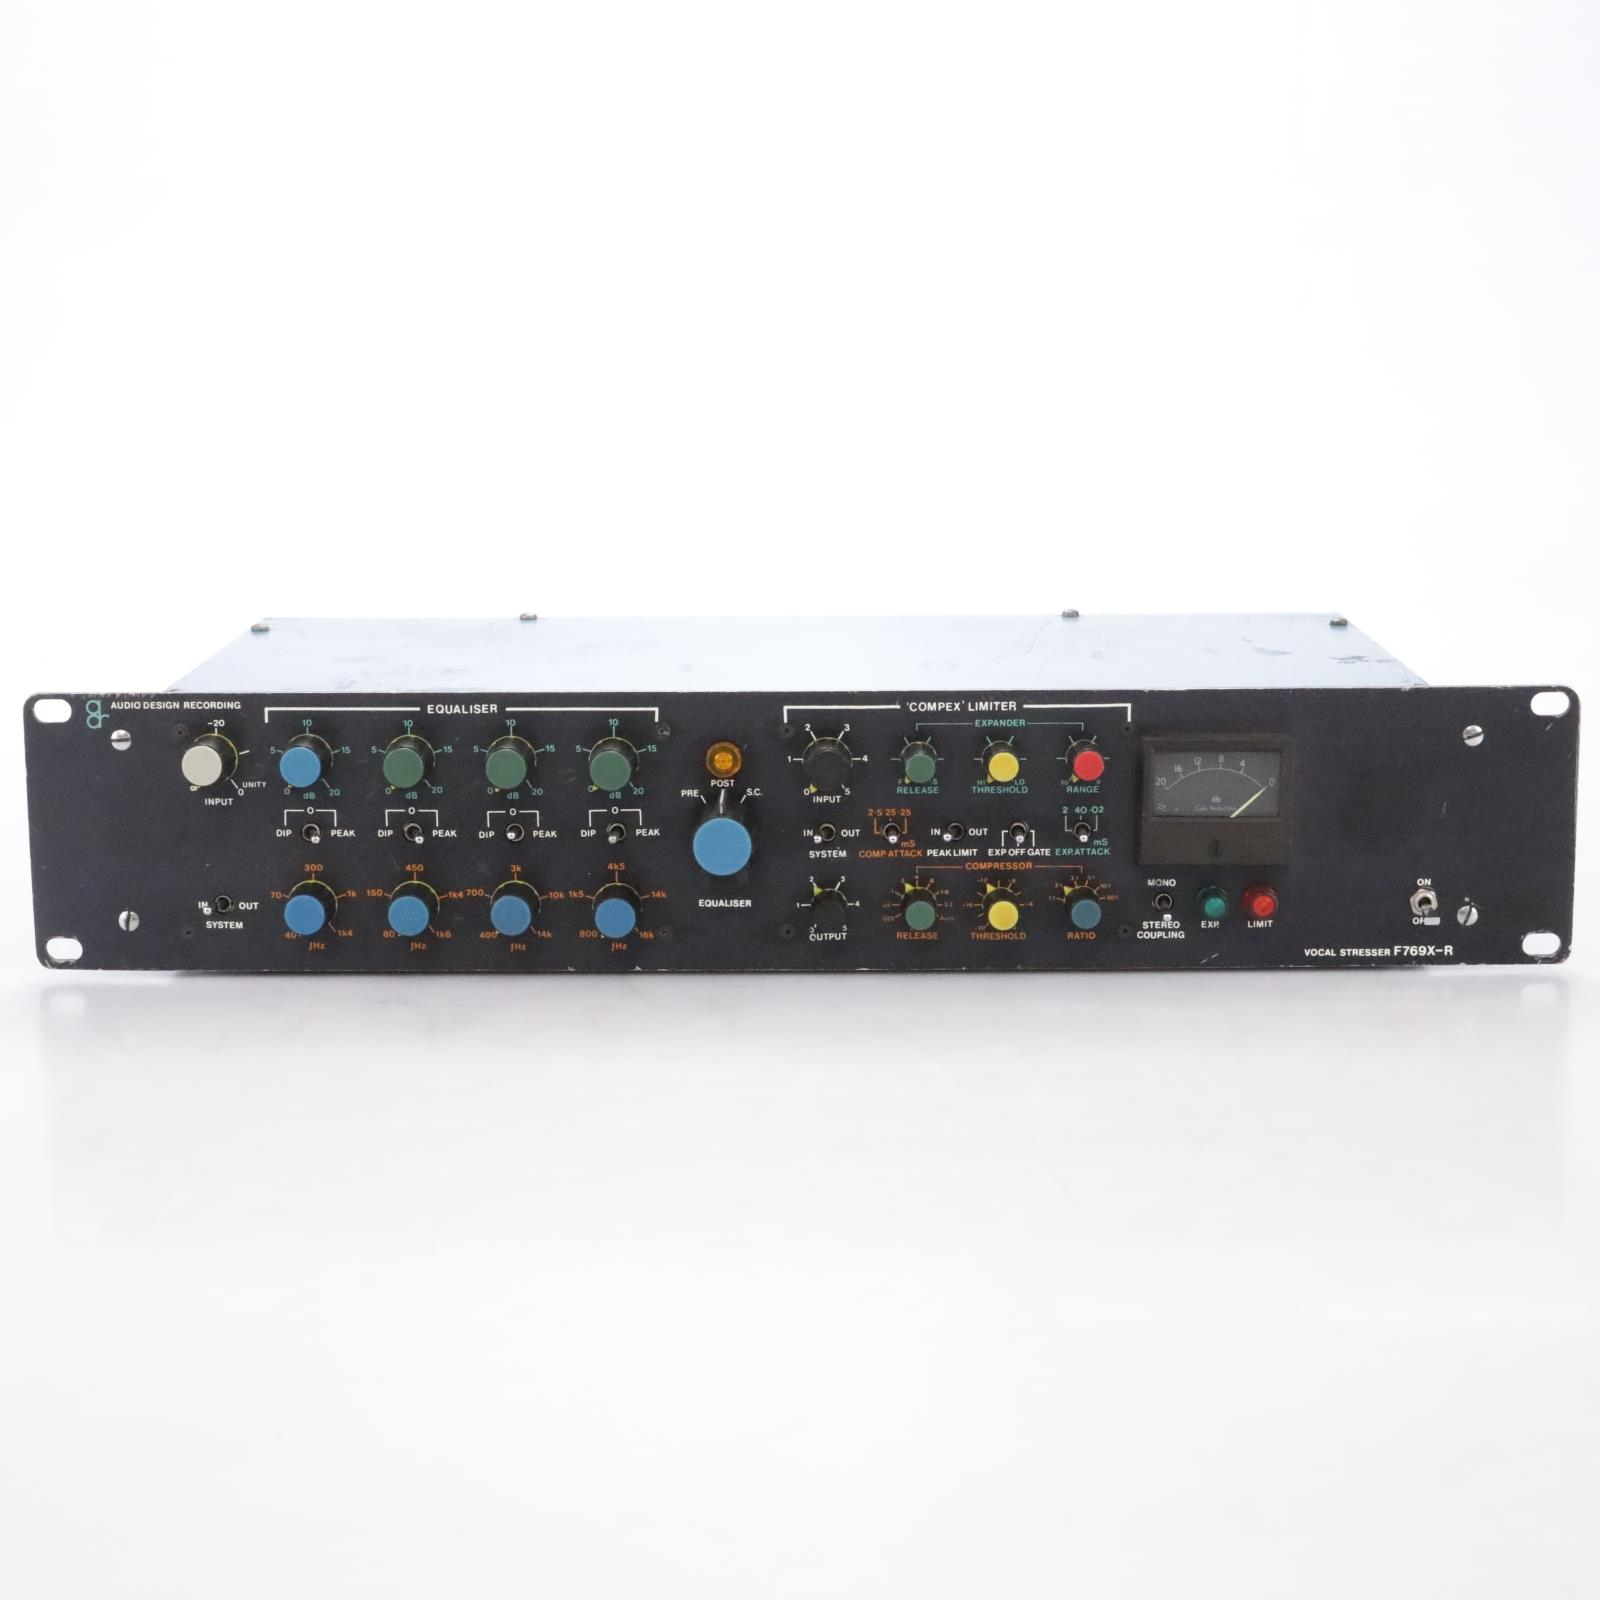 Vintage ADR Audio Design Recording F769X-R Vocal Stresser Compex Limiter #44268